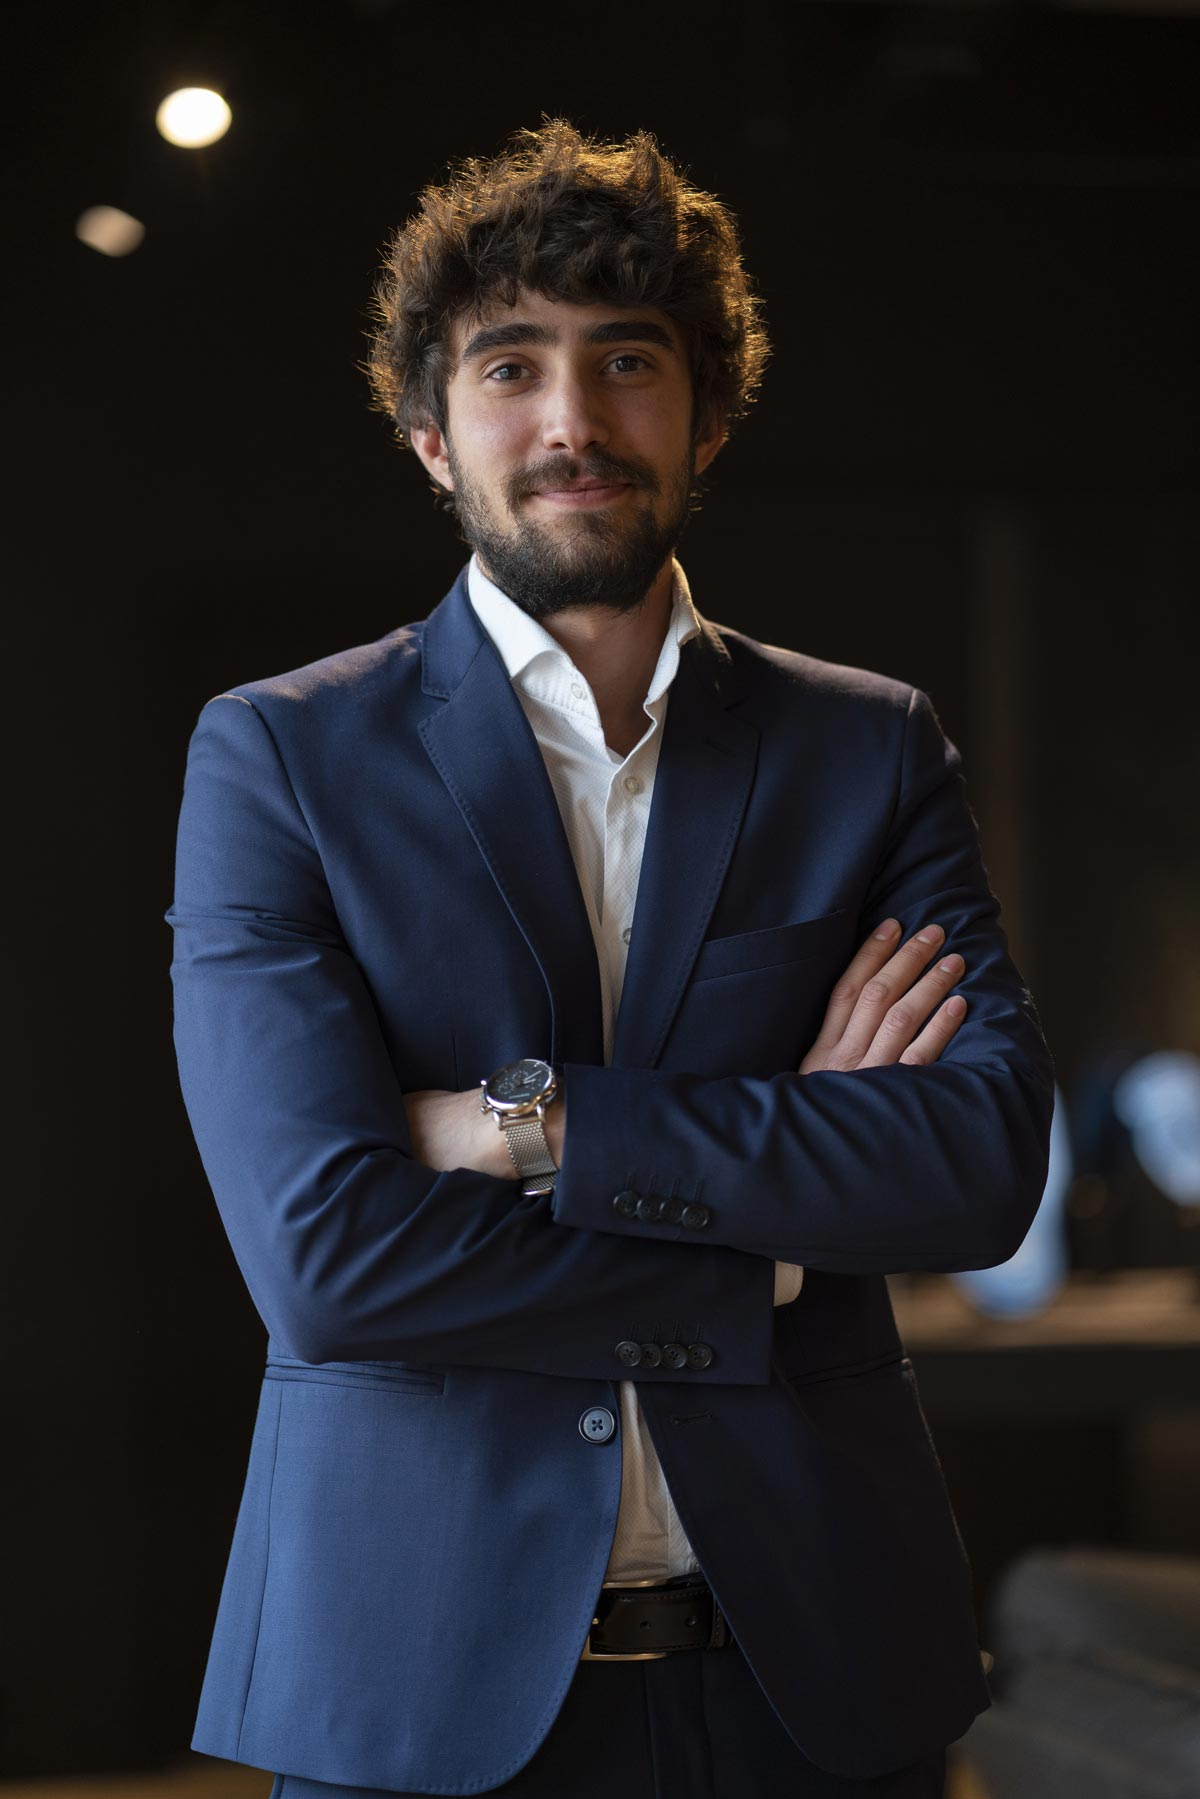 Giacomo Ruol